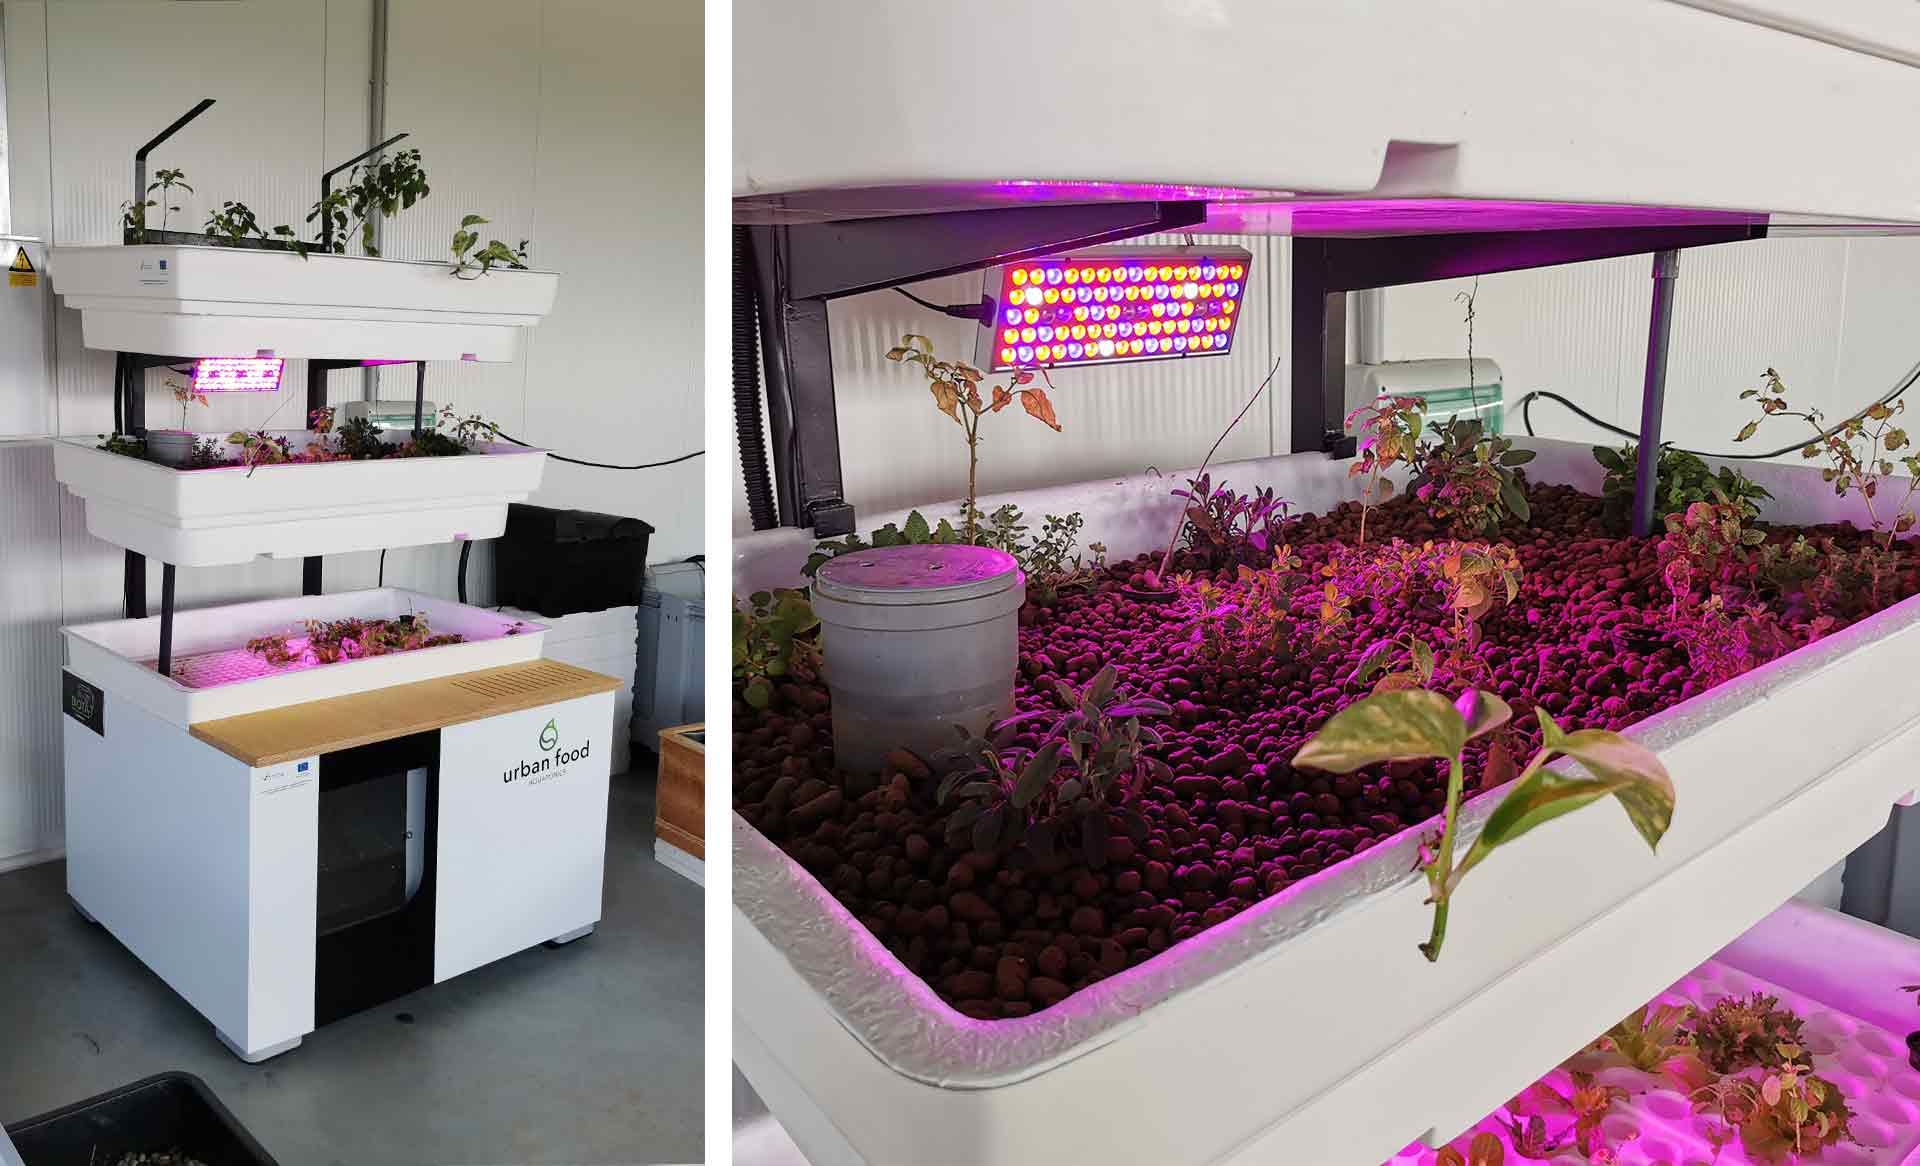 Biota Urban Food baner prototype